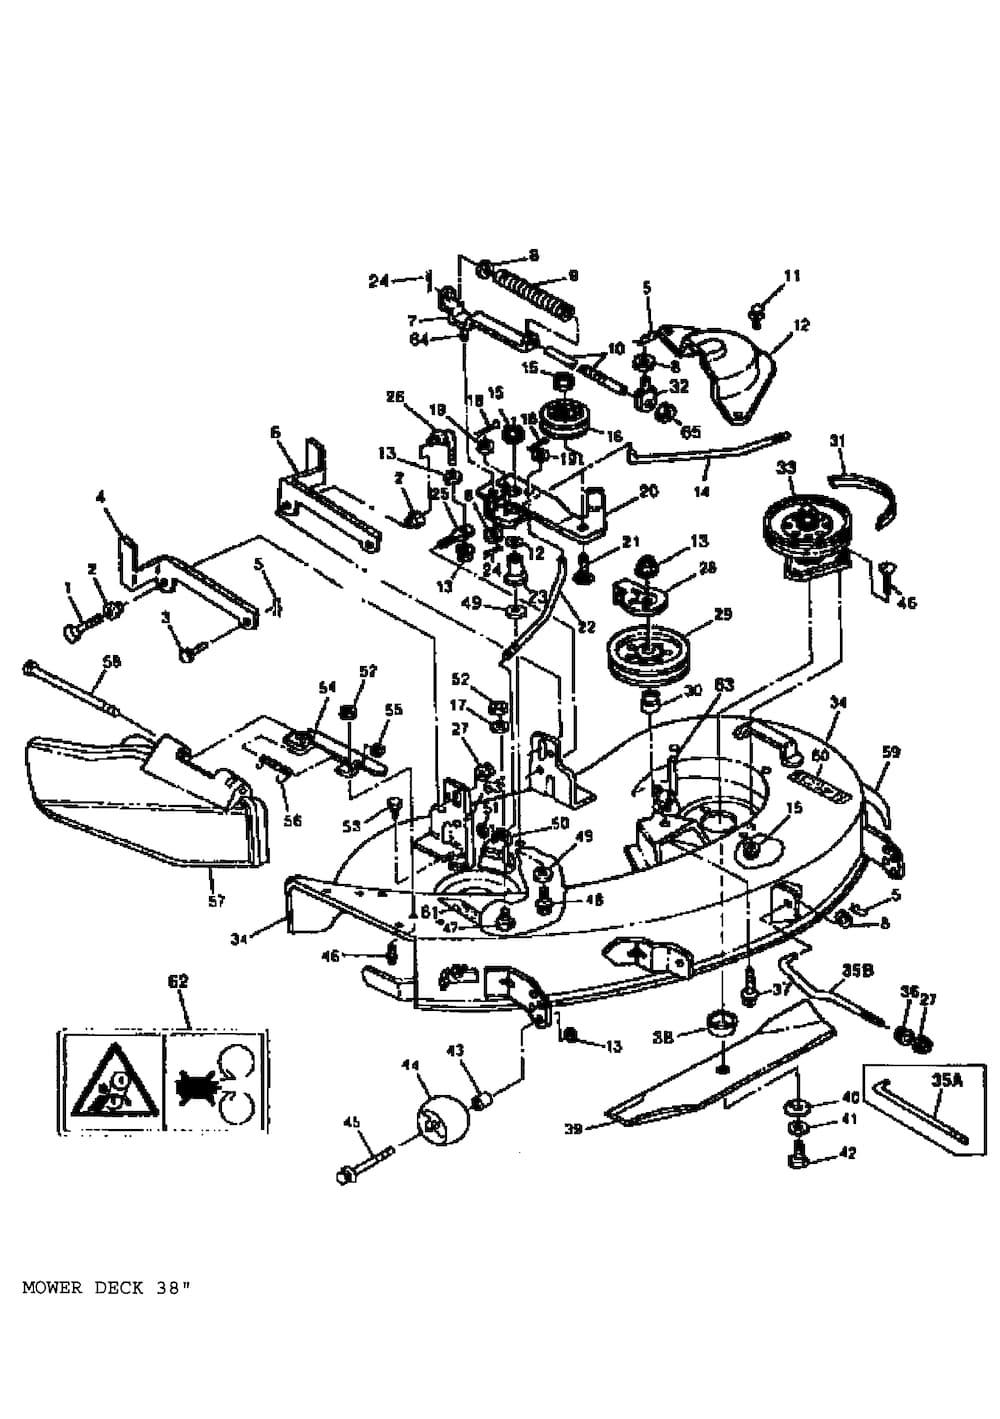 John deere tiller parts john deere parts john deere parts john deere riding mower parts mower deck 38 97cm diagram parts list for model pooptronica